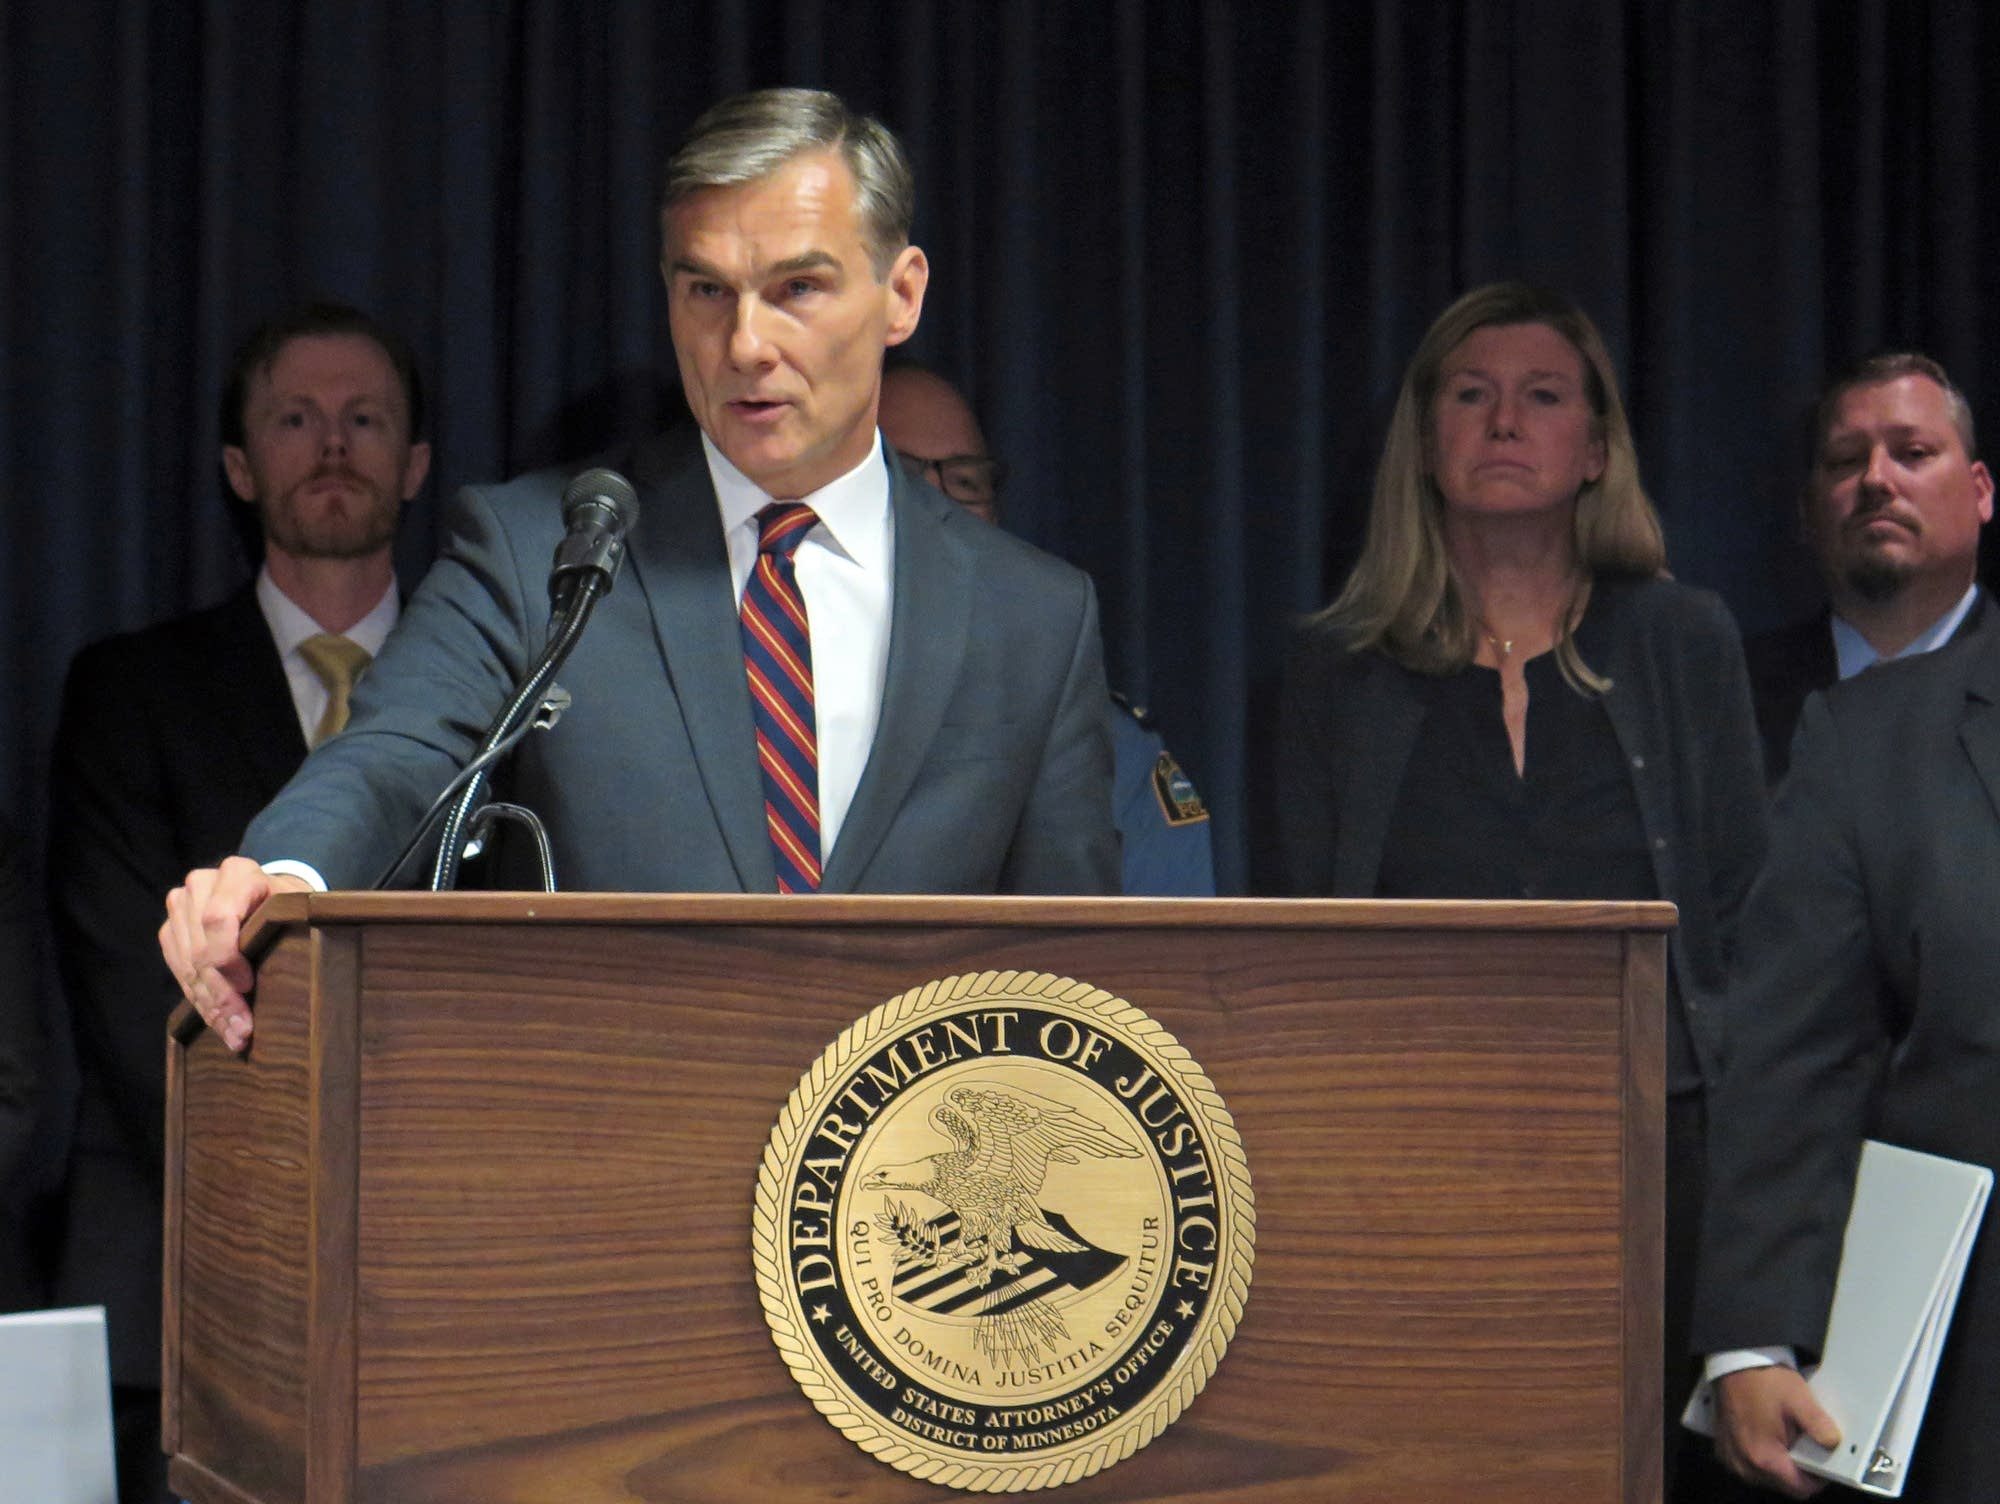 Interim U.S. Attorney Gregory Brooker